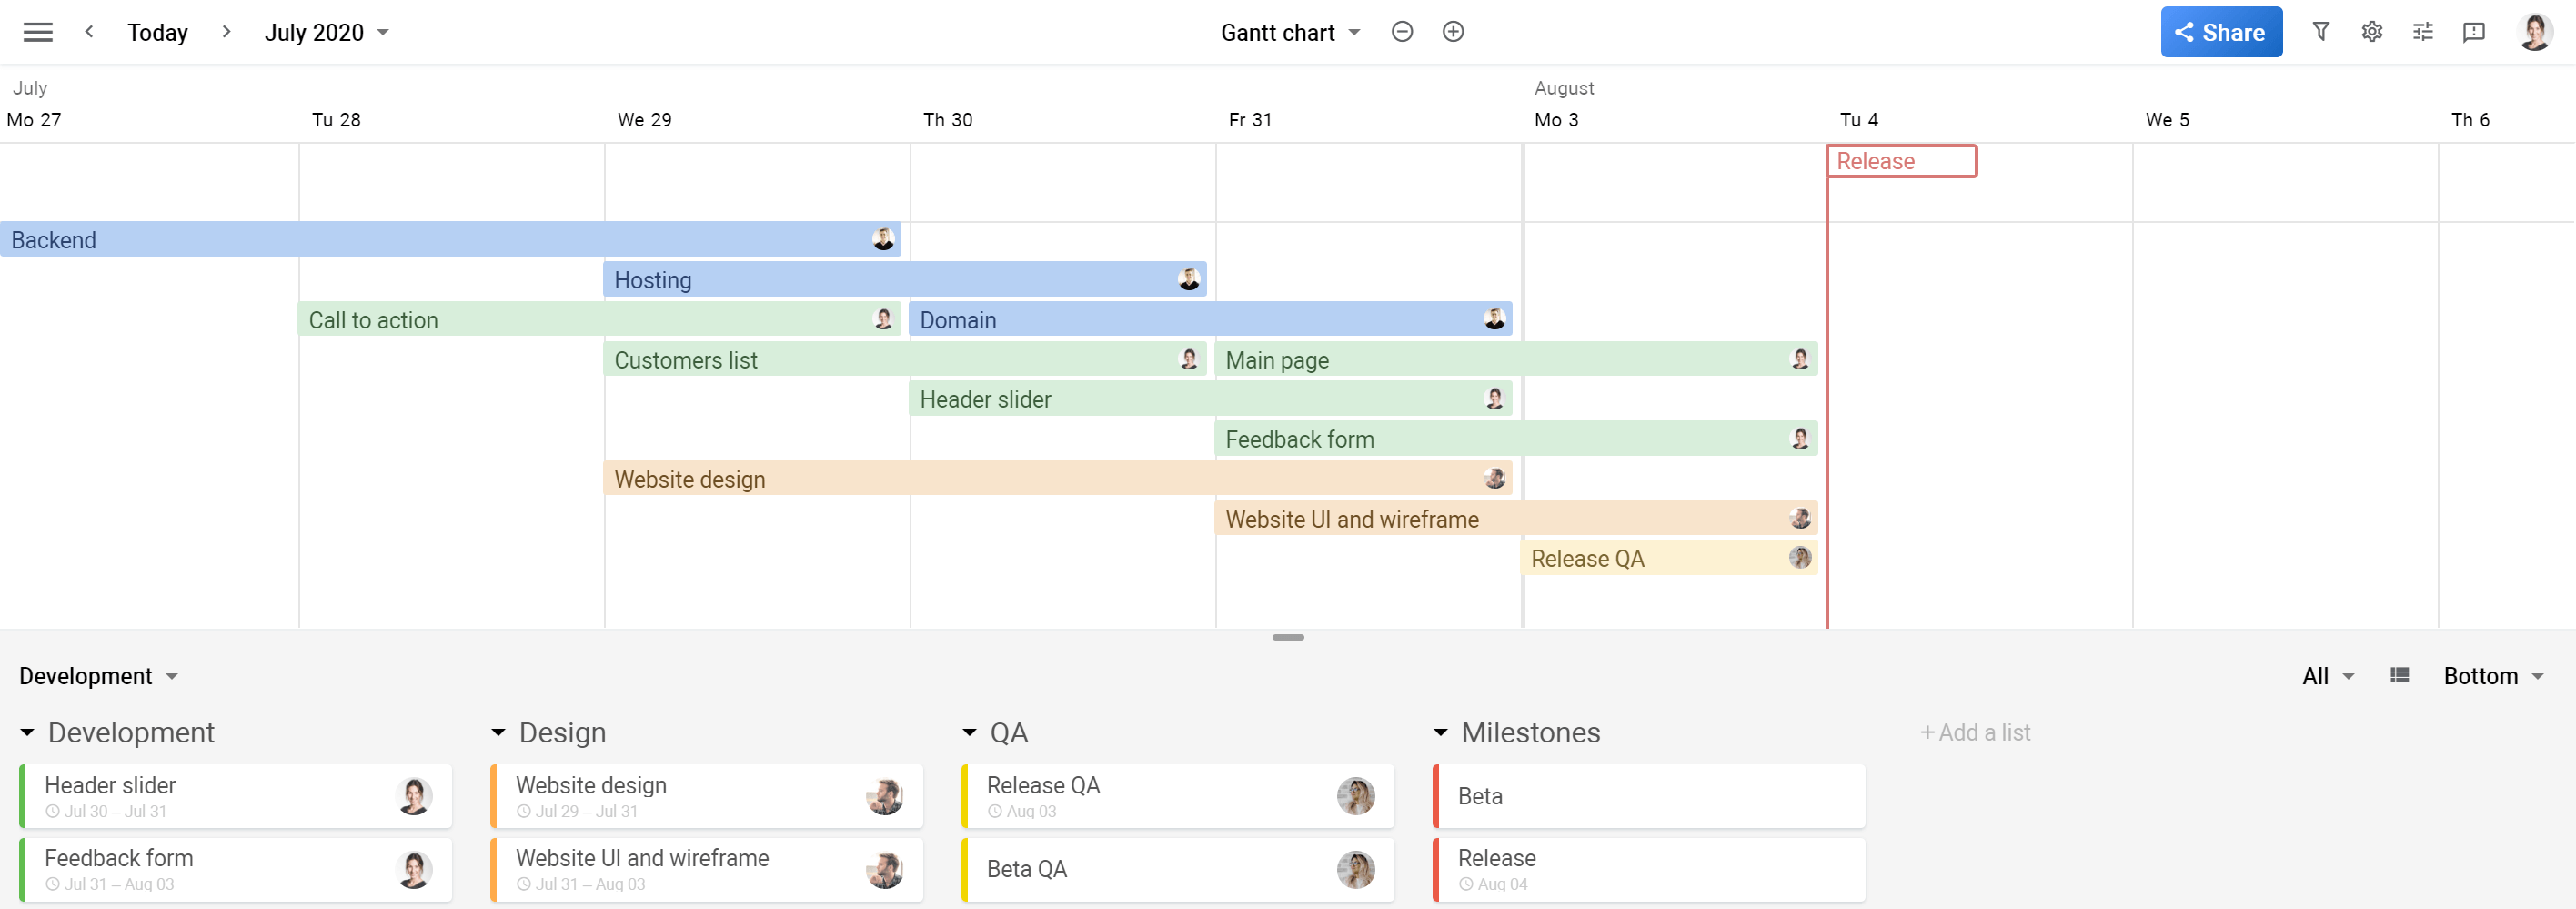 Planyway Team timeline gantt chart